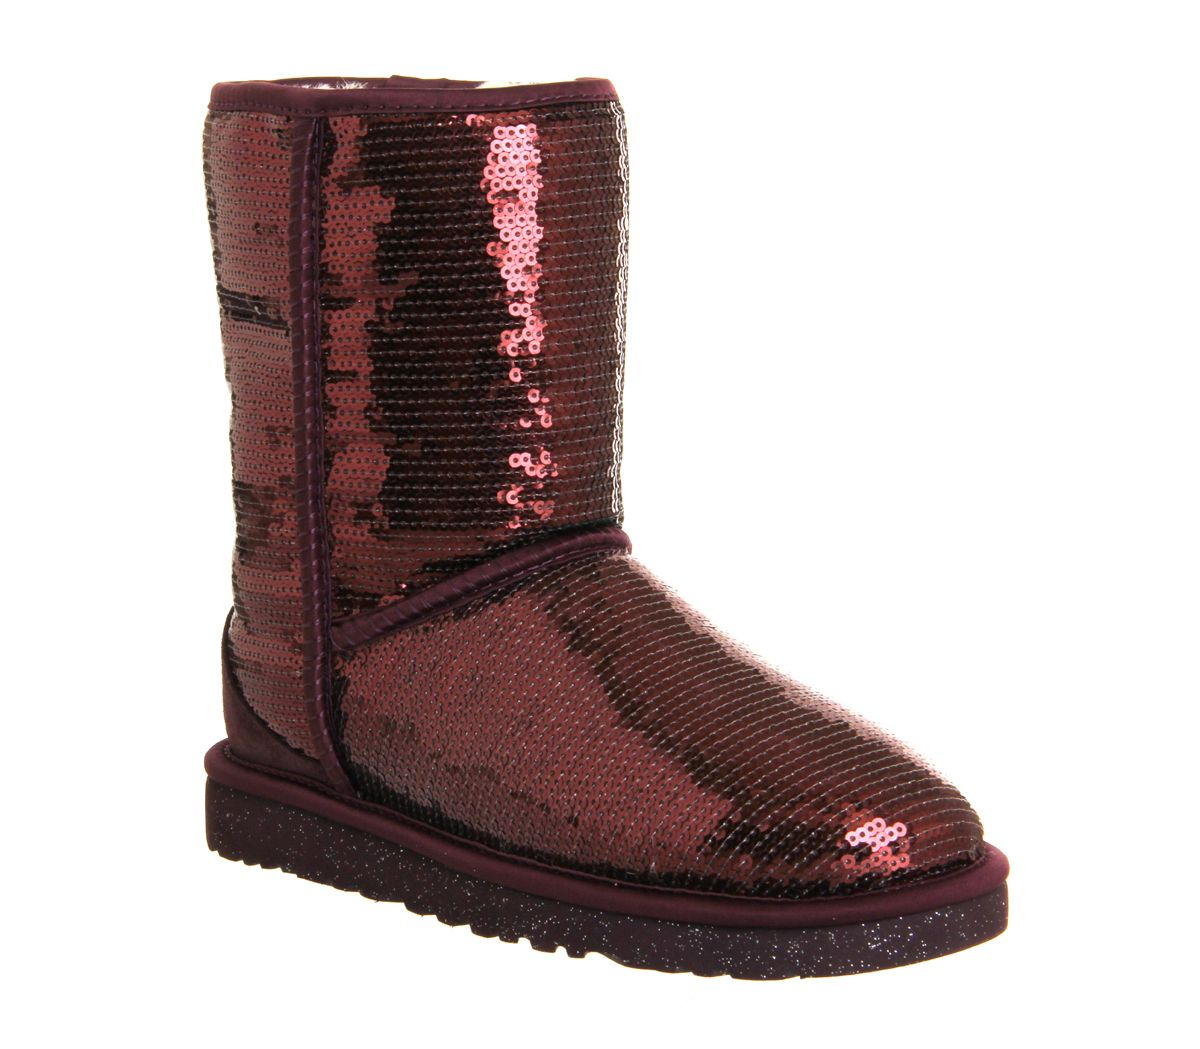 UGG Australia Classic Short Sparkles Port Sequin - Ankle Boots